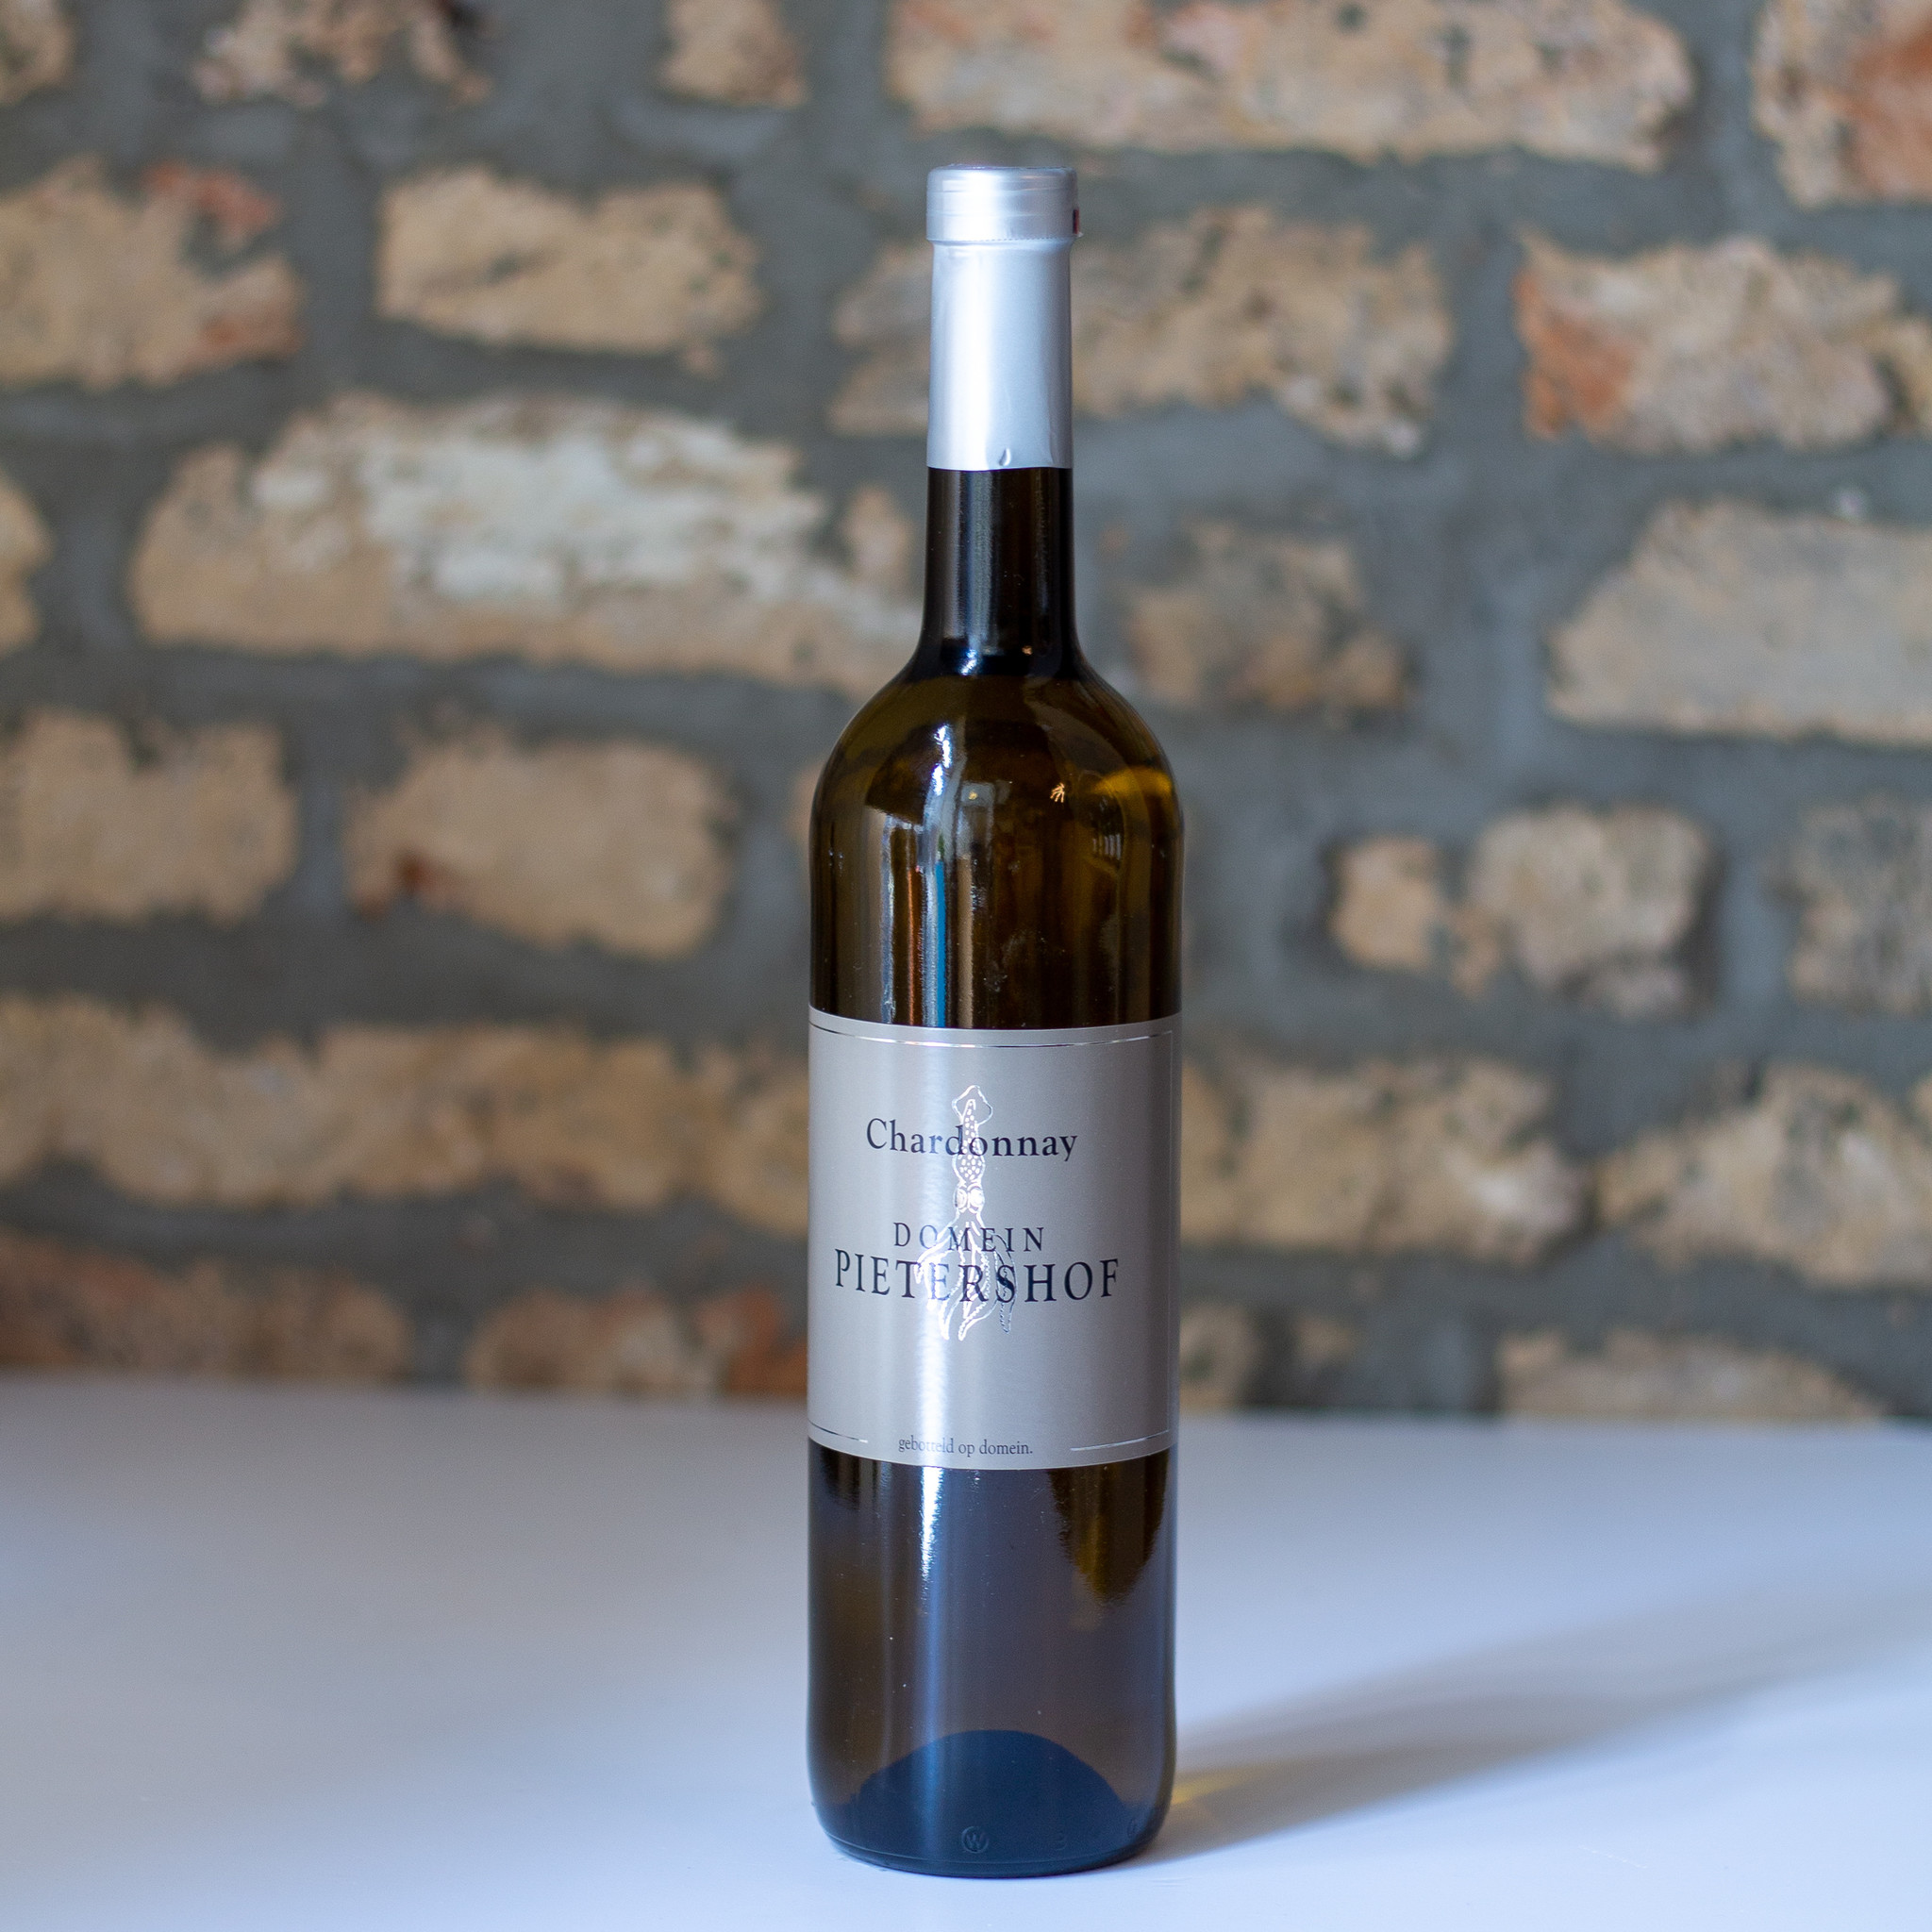 Pietershof Chardonnay 2017-2